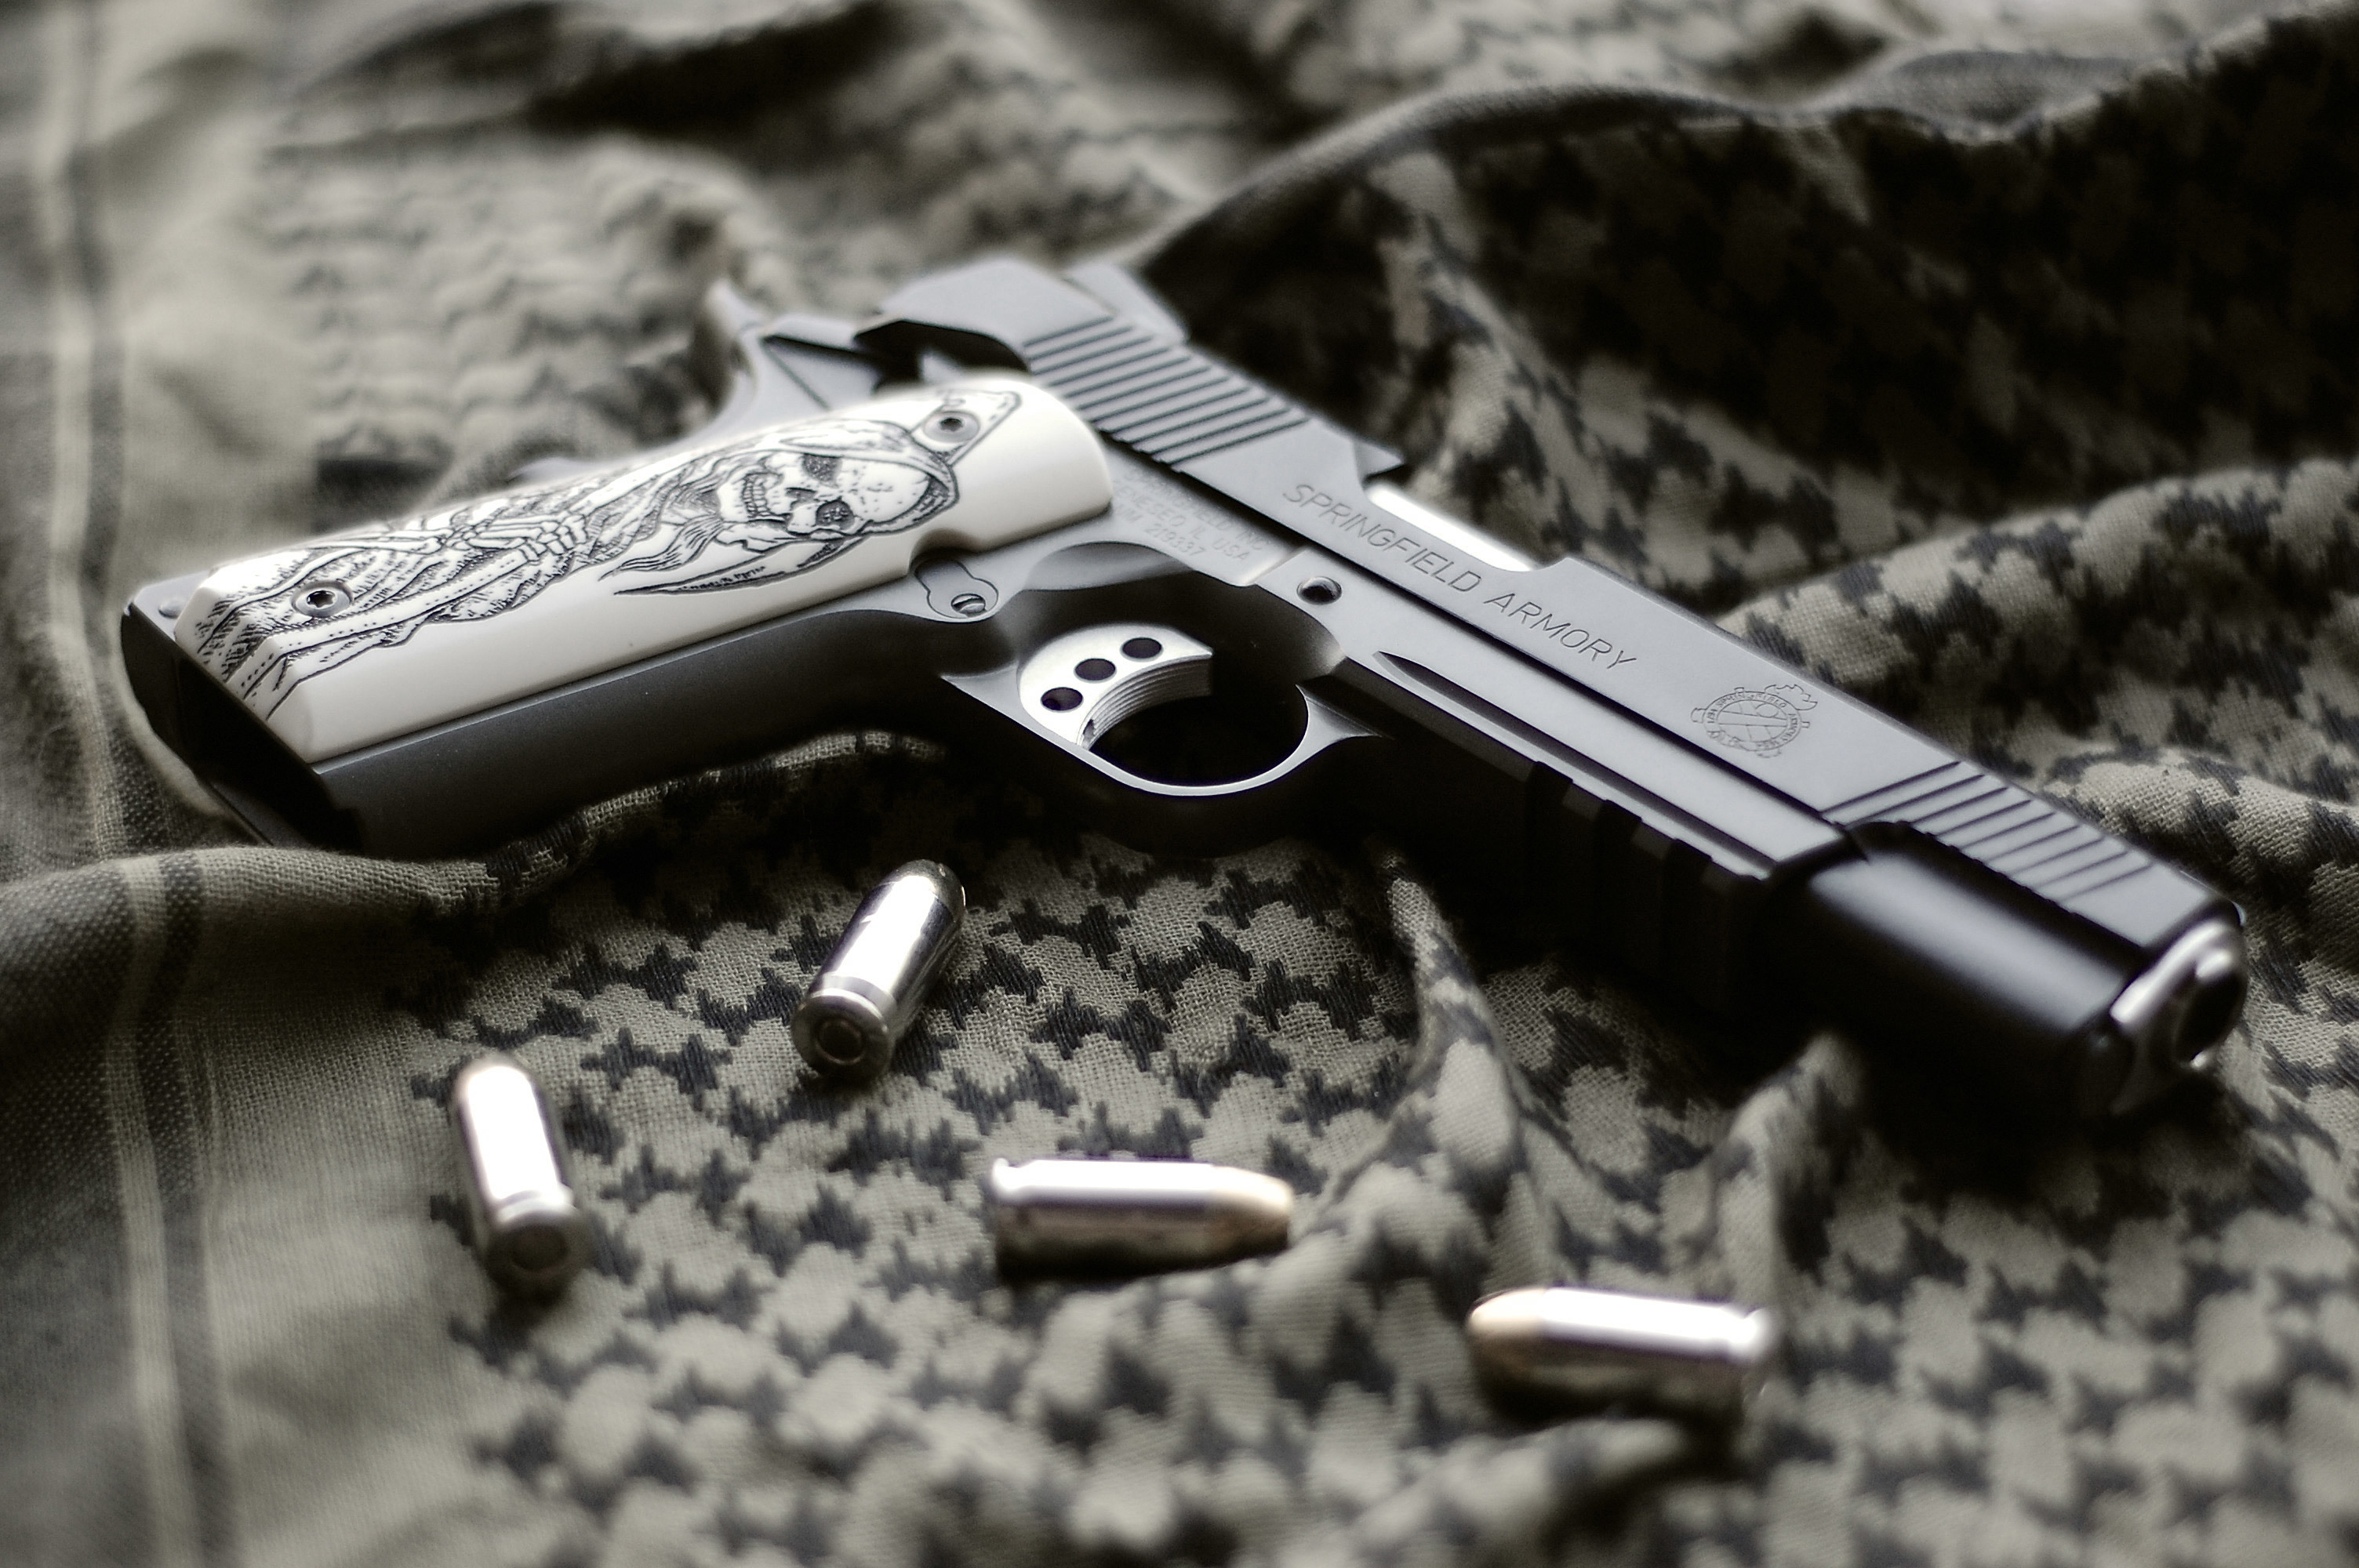 Springfield Armory Pistol HD Wallpaper